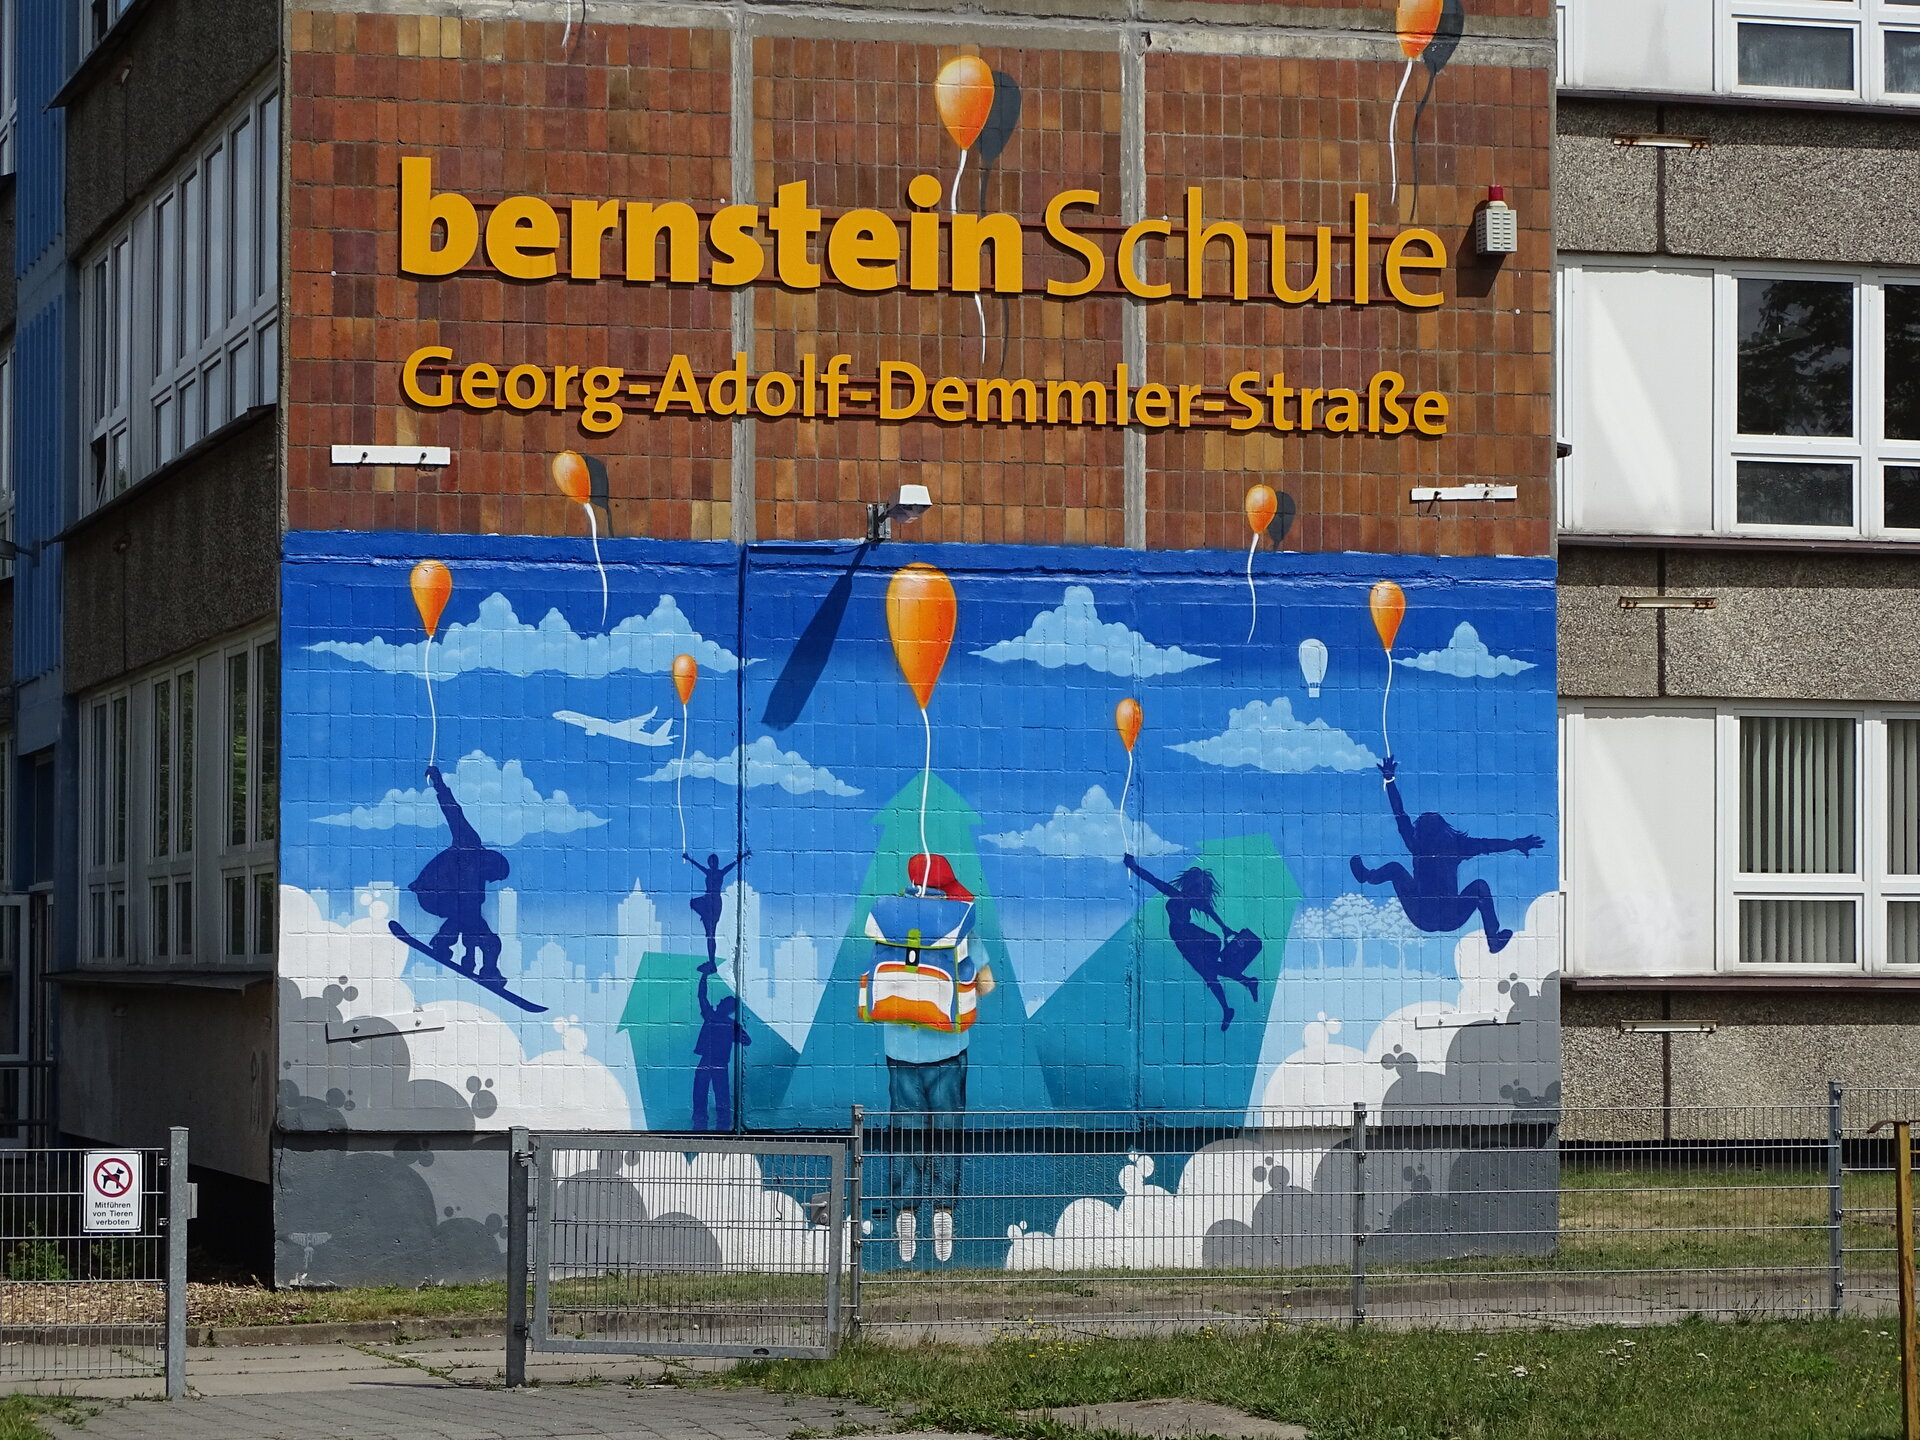 Grundschule bernsteinschule